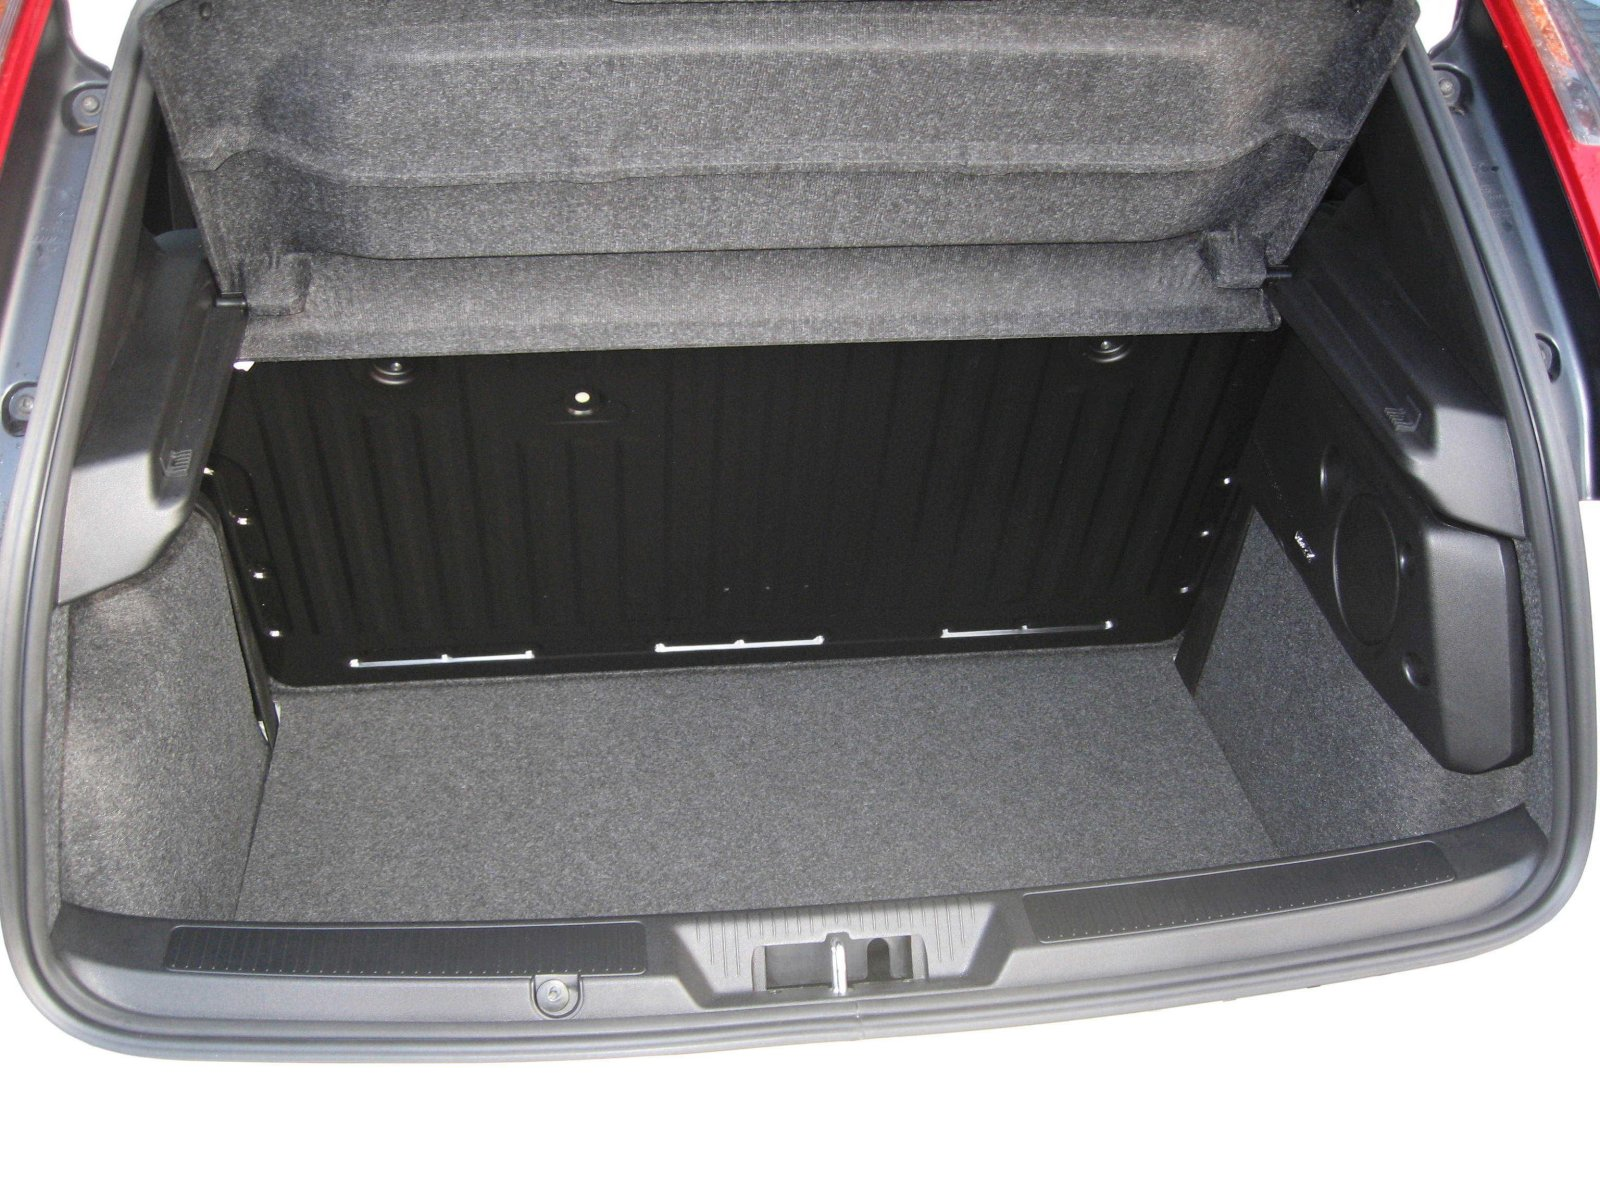 test drive rpt fiat abarth grande punto 1 4 t jet 155ch auto titre. Black Bedroom Furniture Sets. Home Design Ideas